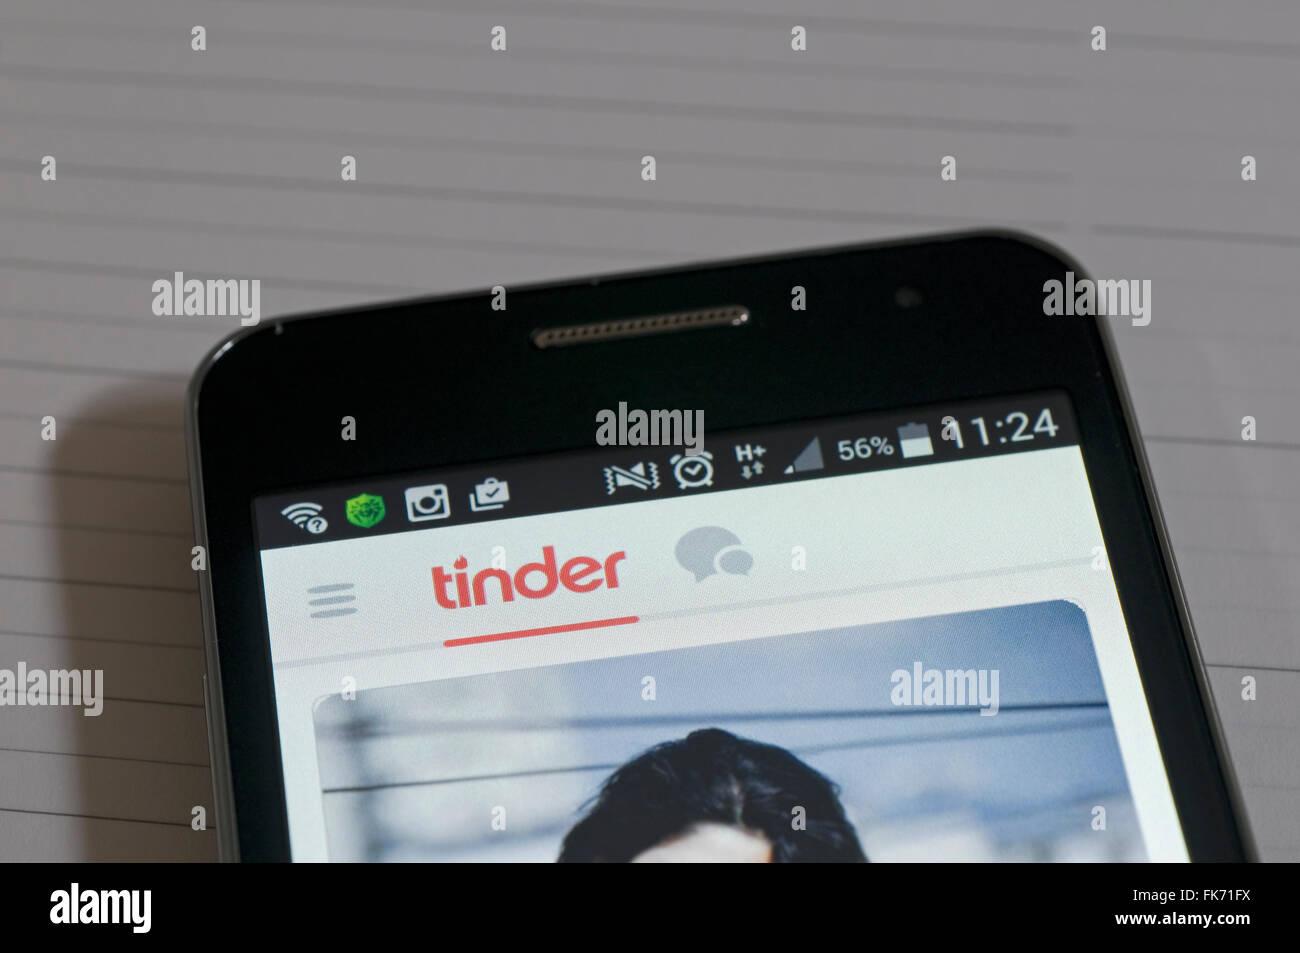 Tinder dating app on smartphone - Stock Image